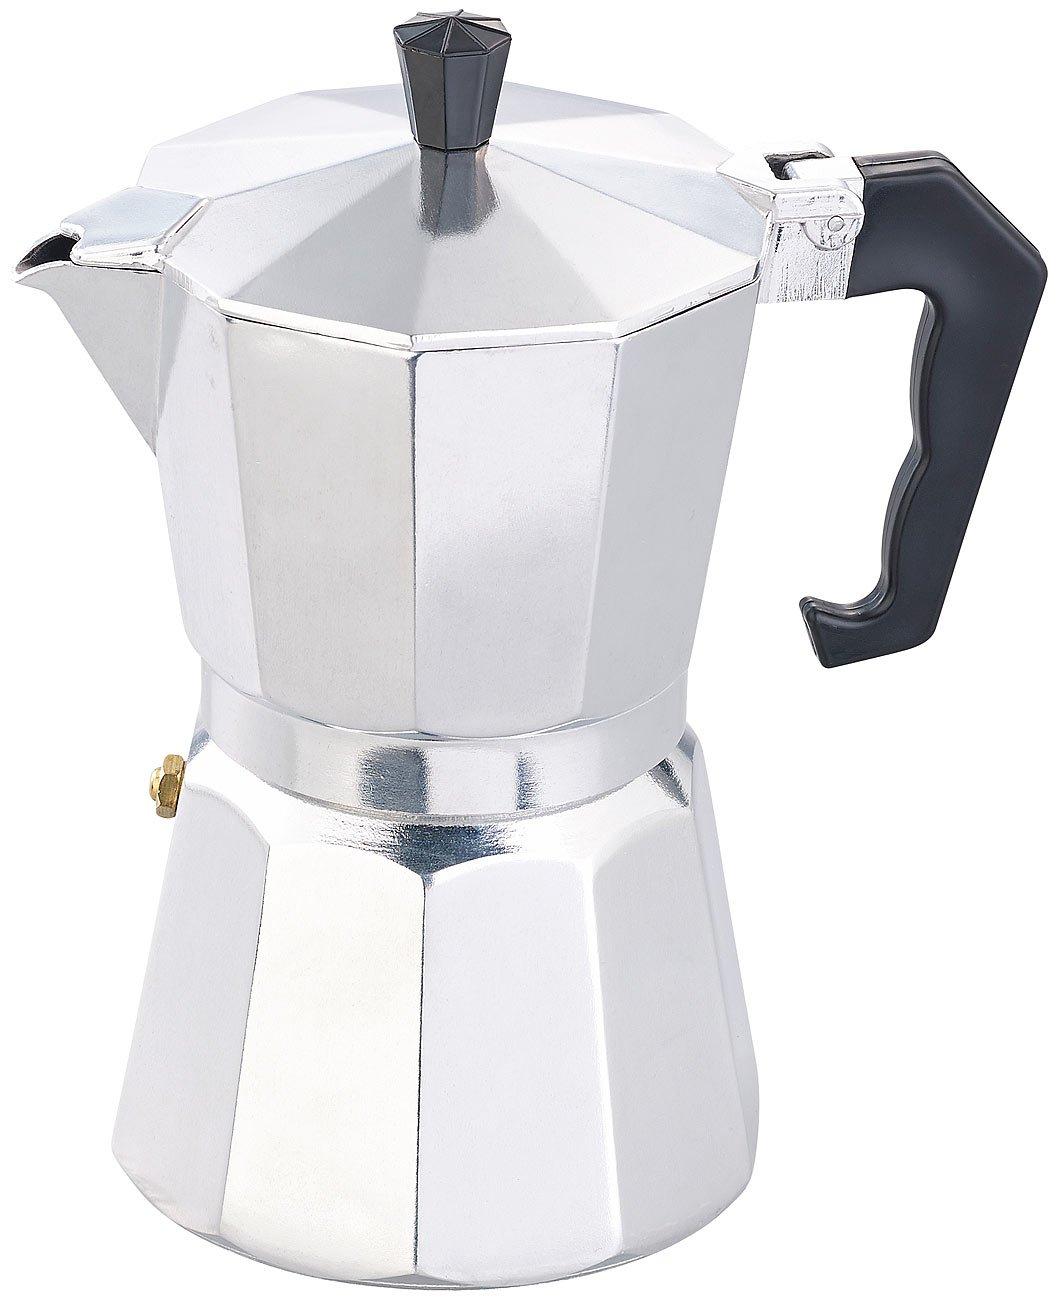 Cucina di Modena Espresso de eléctrica para 6 tazas, para Gas ...